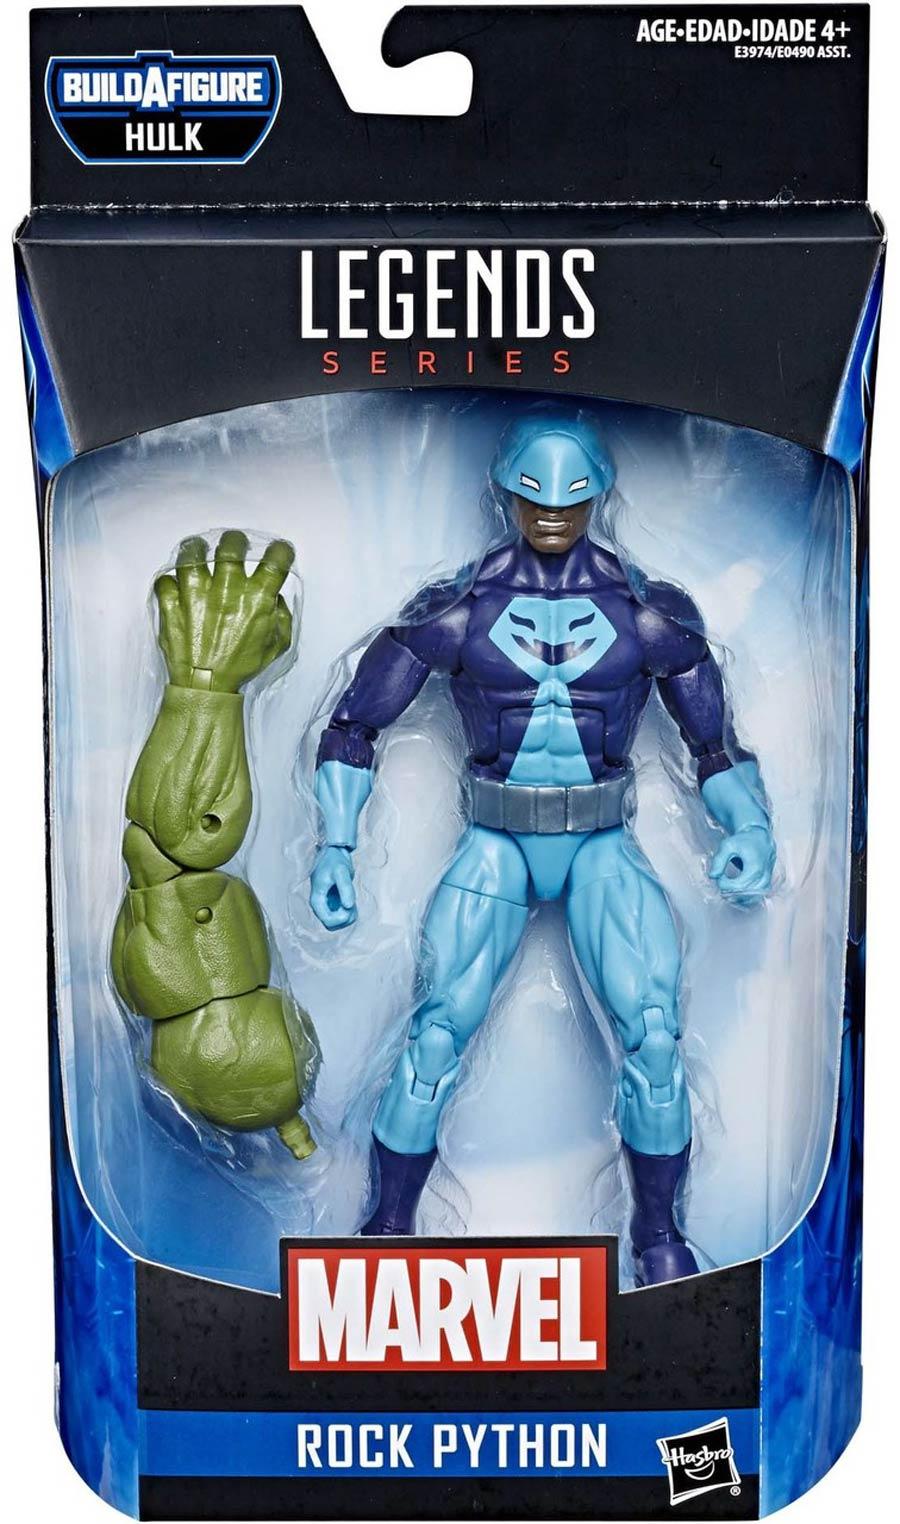 Marvel Avengers Legends 2019 6-Inch Action Figure - Rock Python